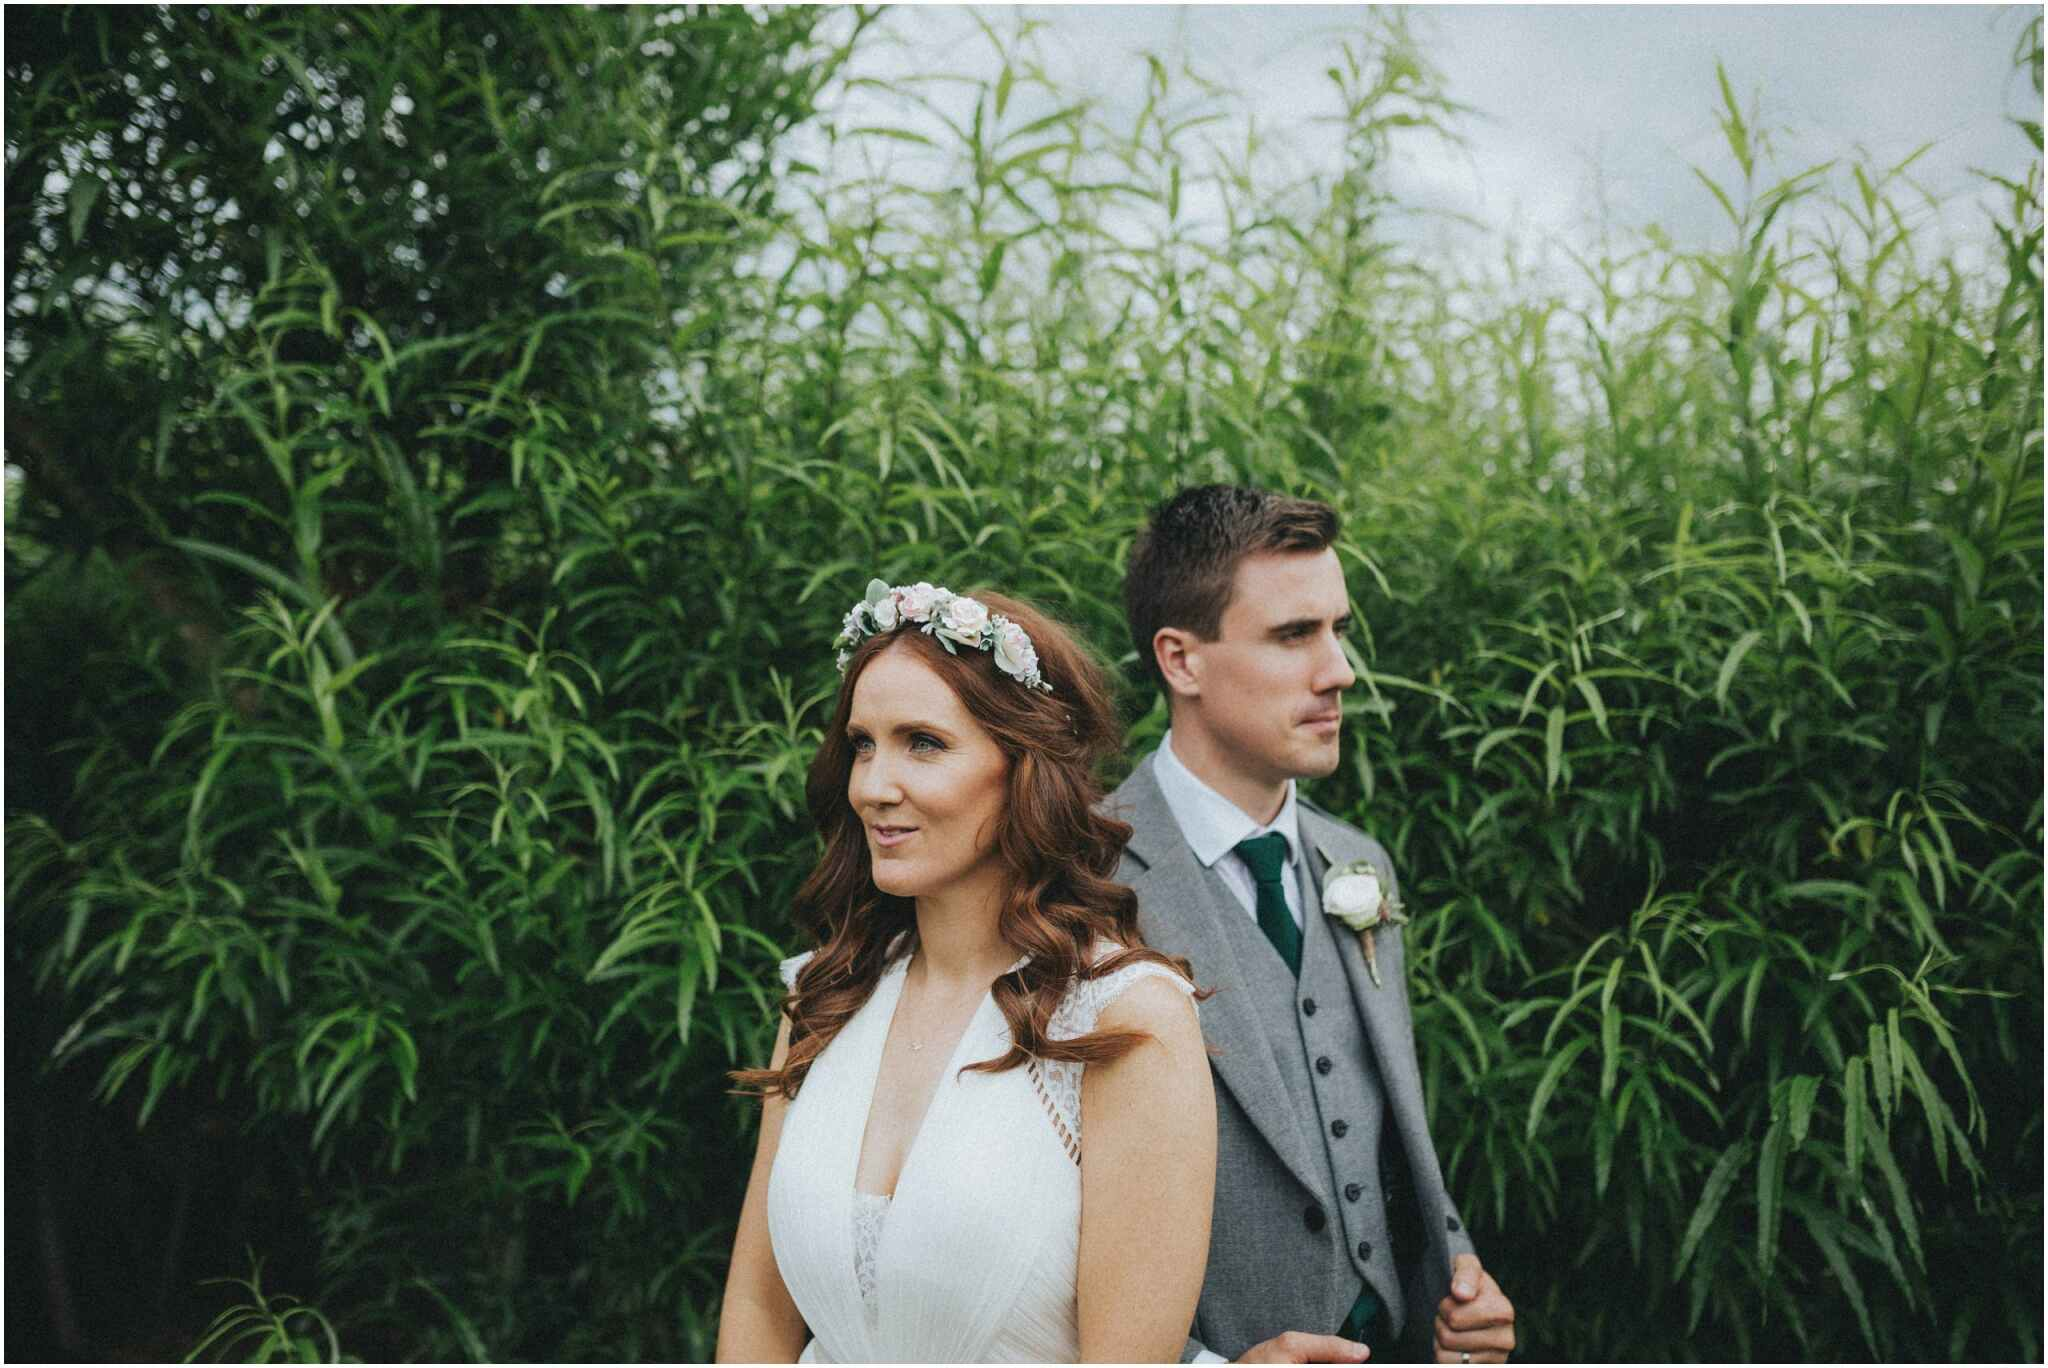 Fionnuala + Paul - Mount Druid Alternative Wedding 135